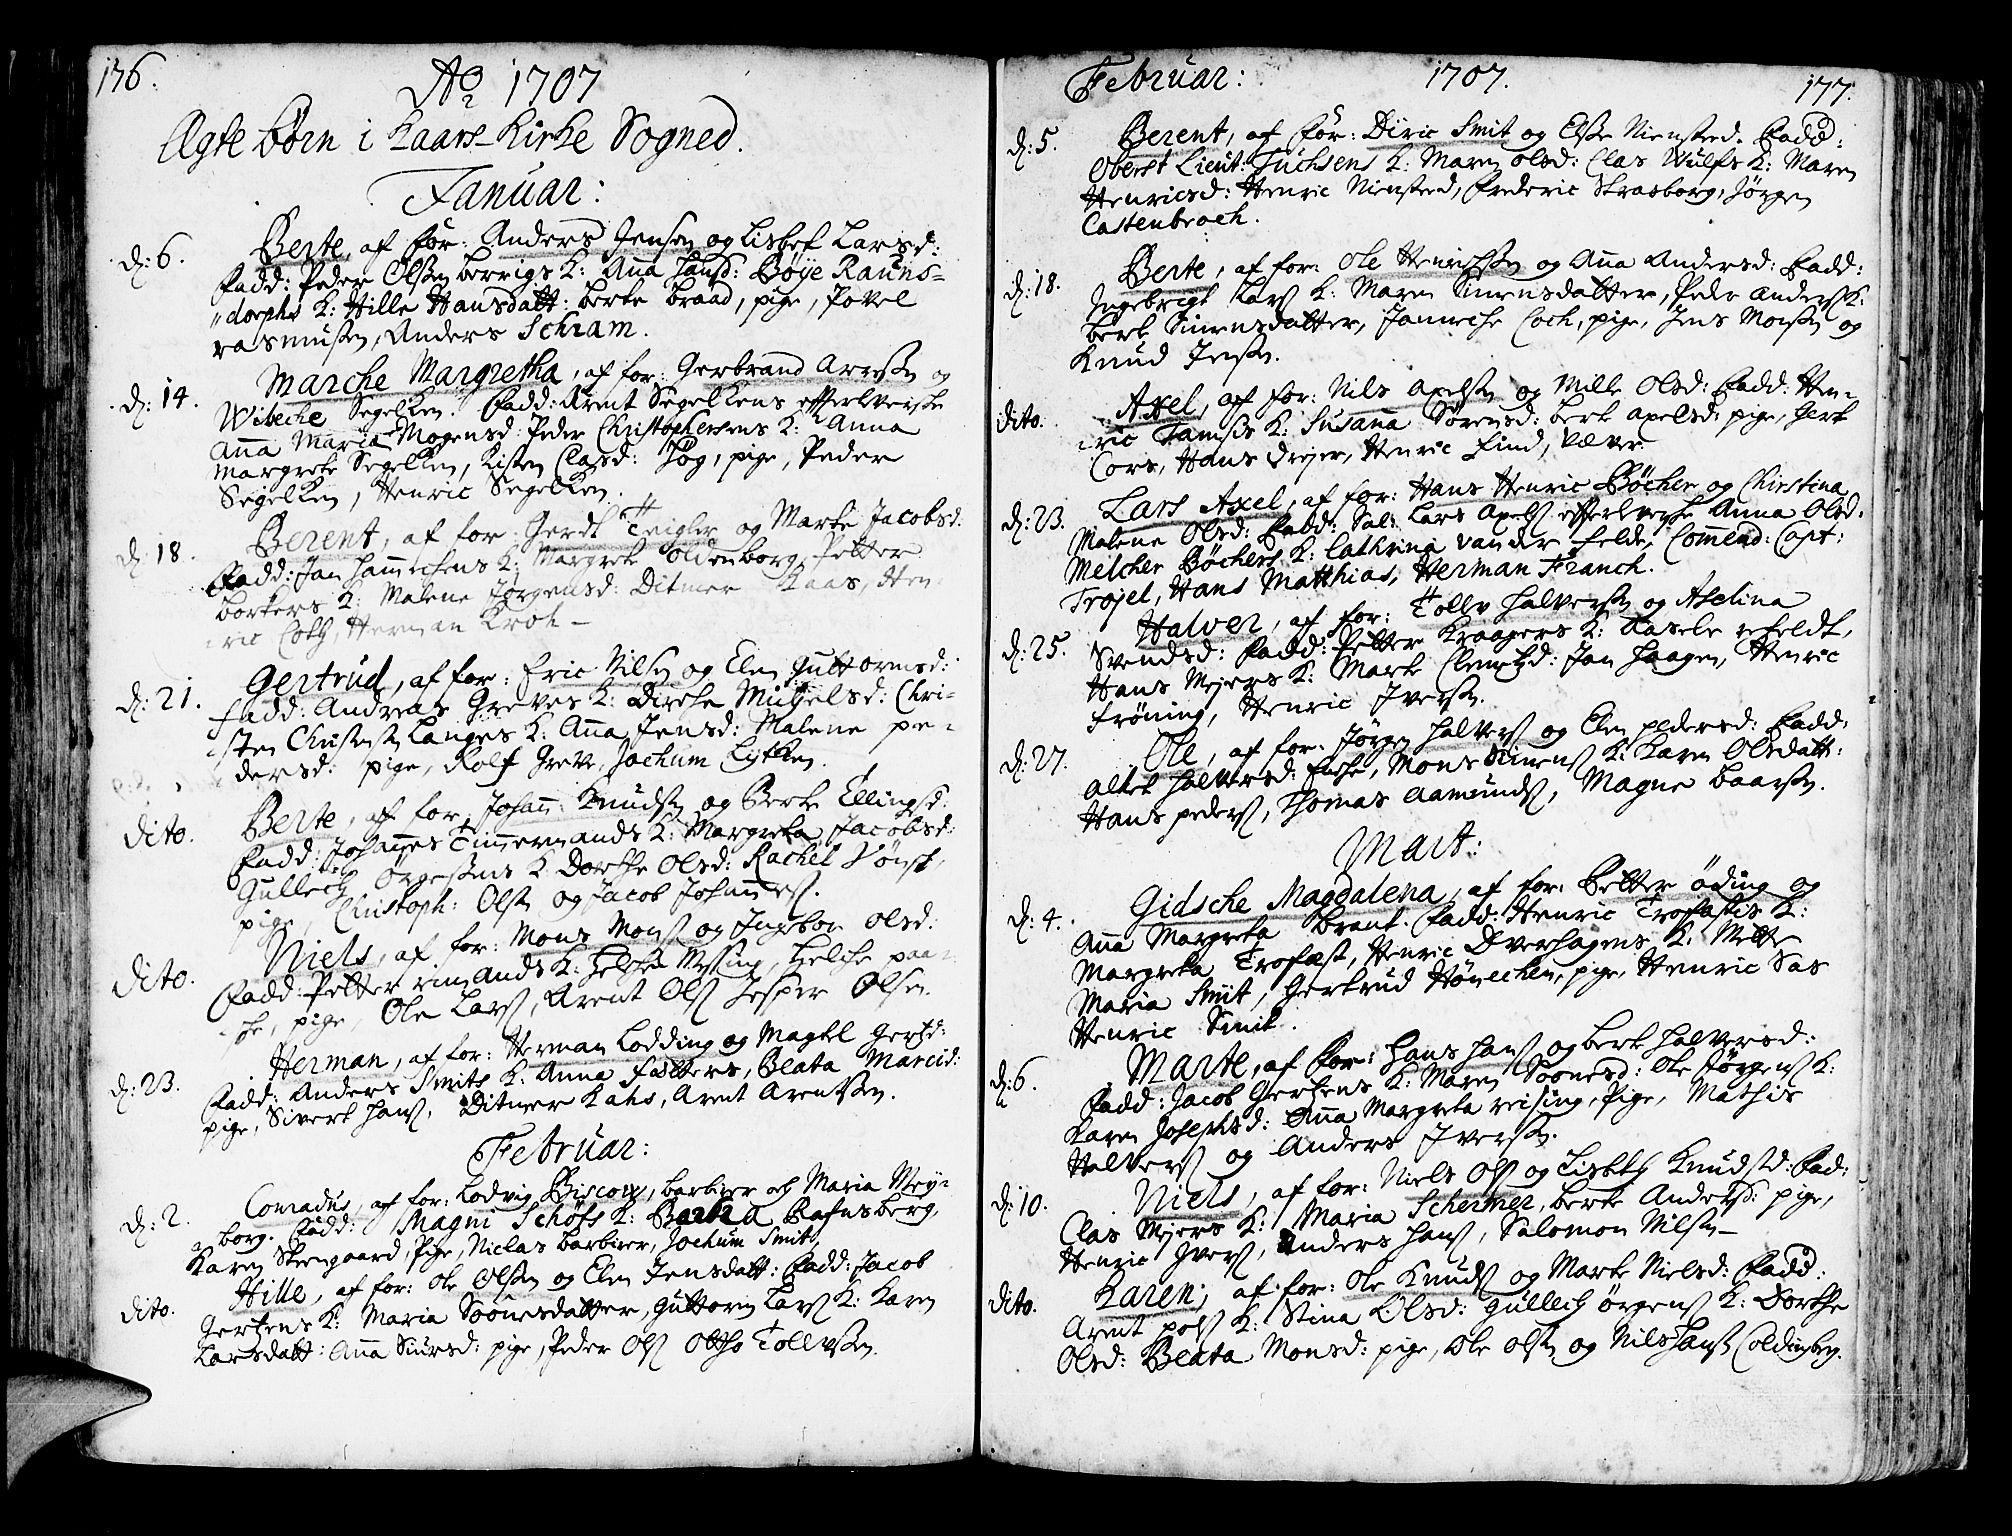 SAB, Korskirken Sokneprestembete, H/Haa/L0003: Ministerialbok nr. A 3, 1698-1719, s. 176-177